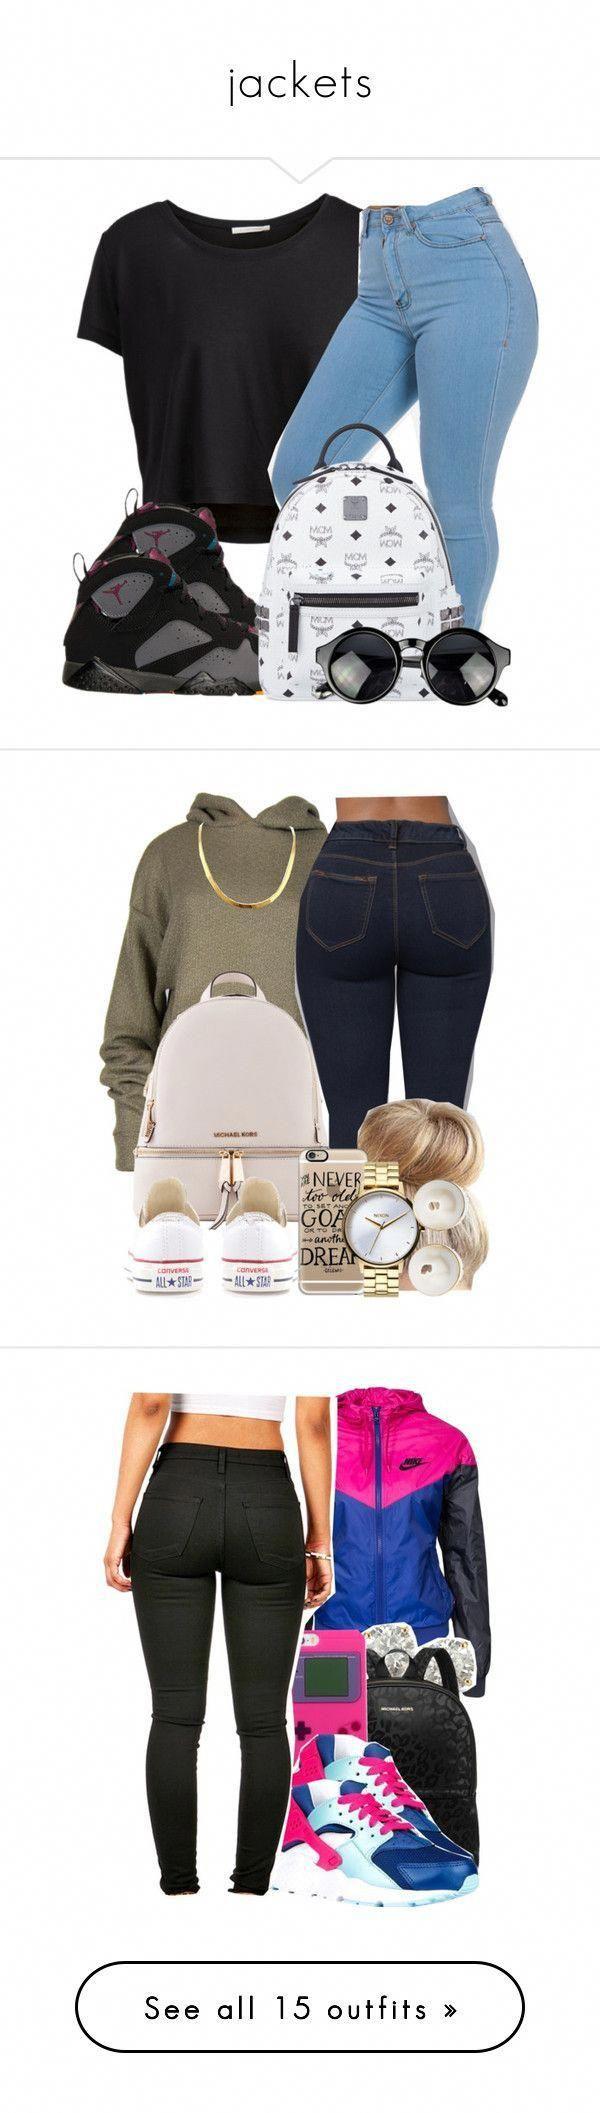 Astounding Tips: Urban Wear Women Christmas Gifts urban fashion girls life.Urban Fashion Streetwear African American urban fashion kids boys.Urban Fas...